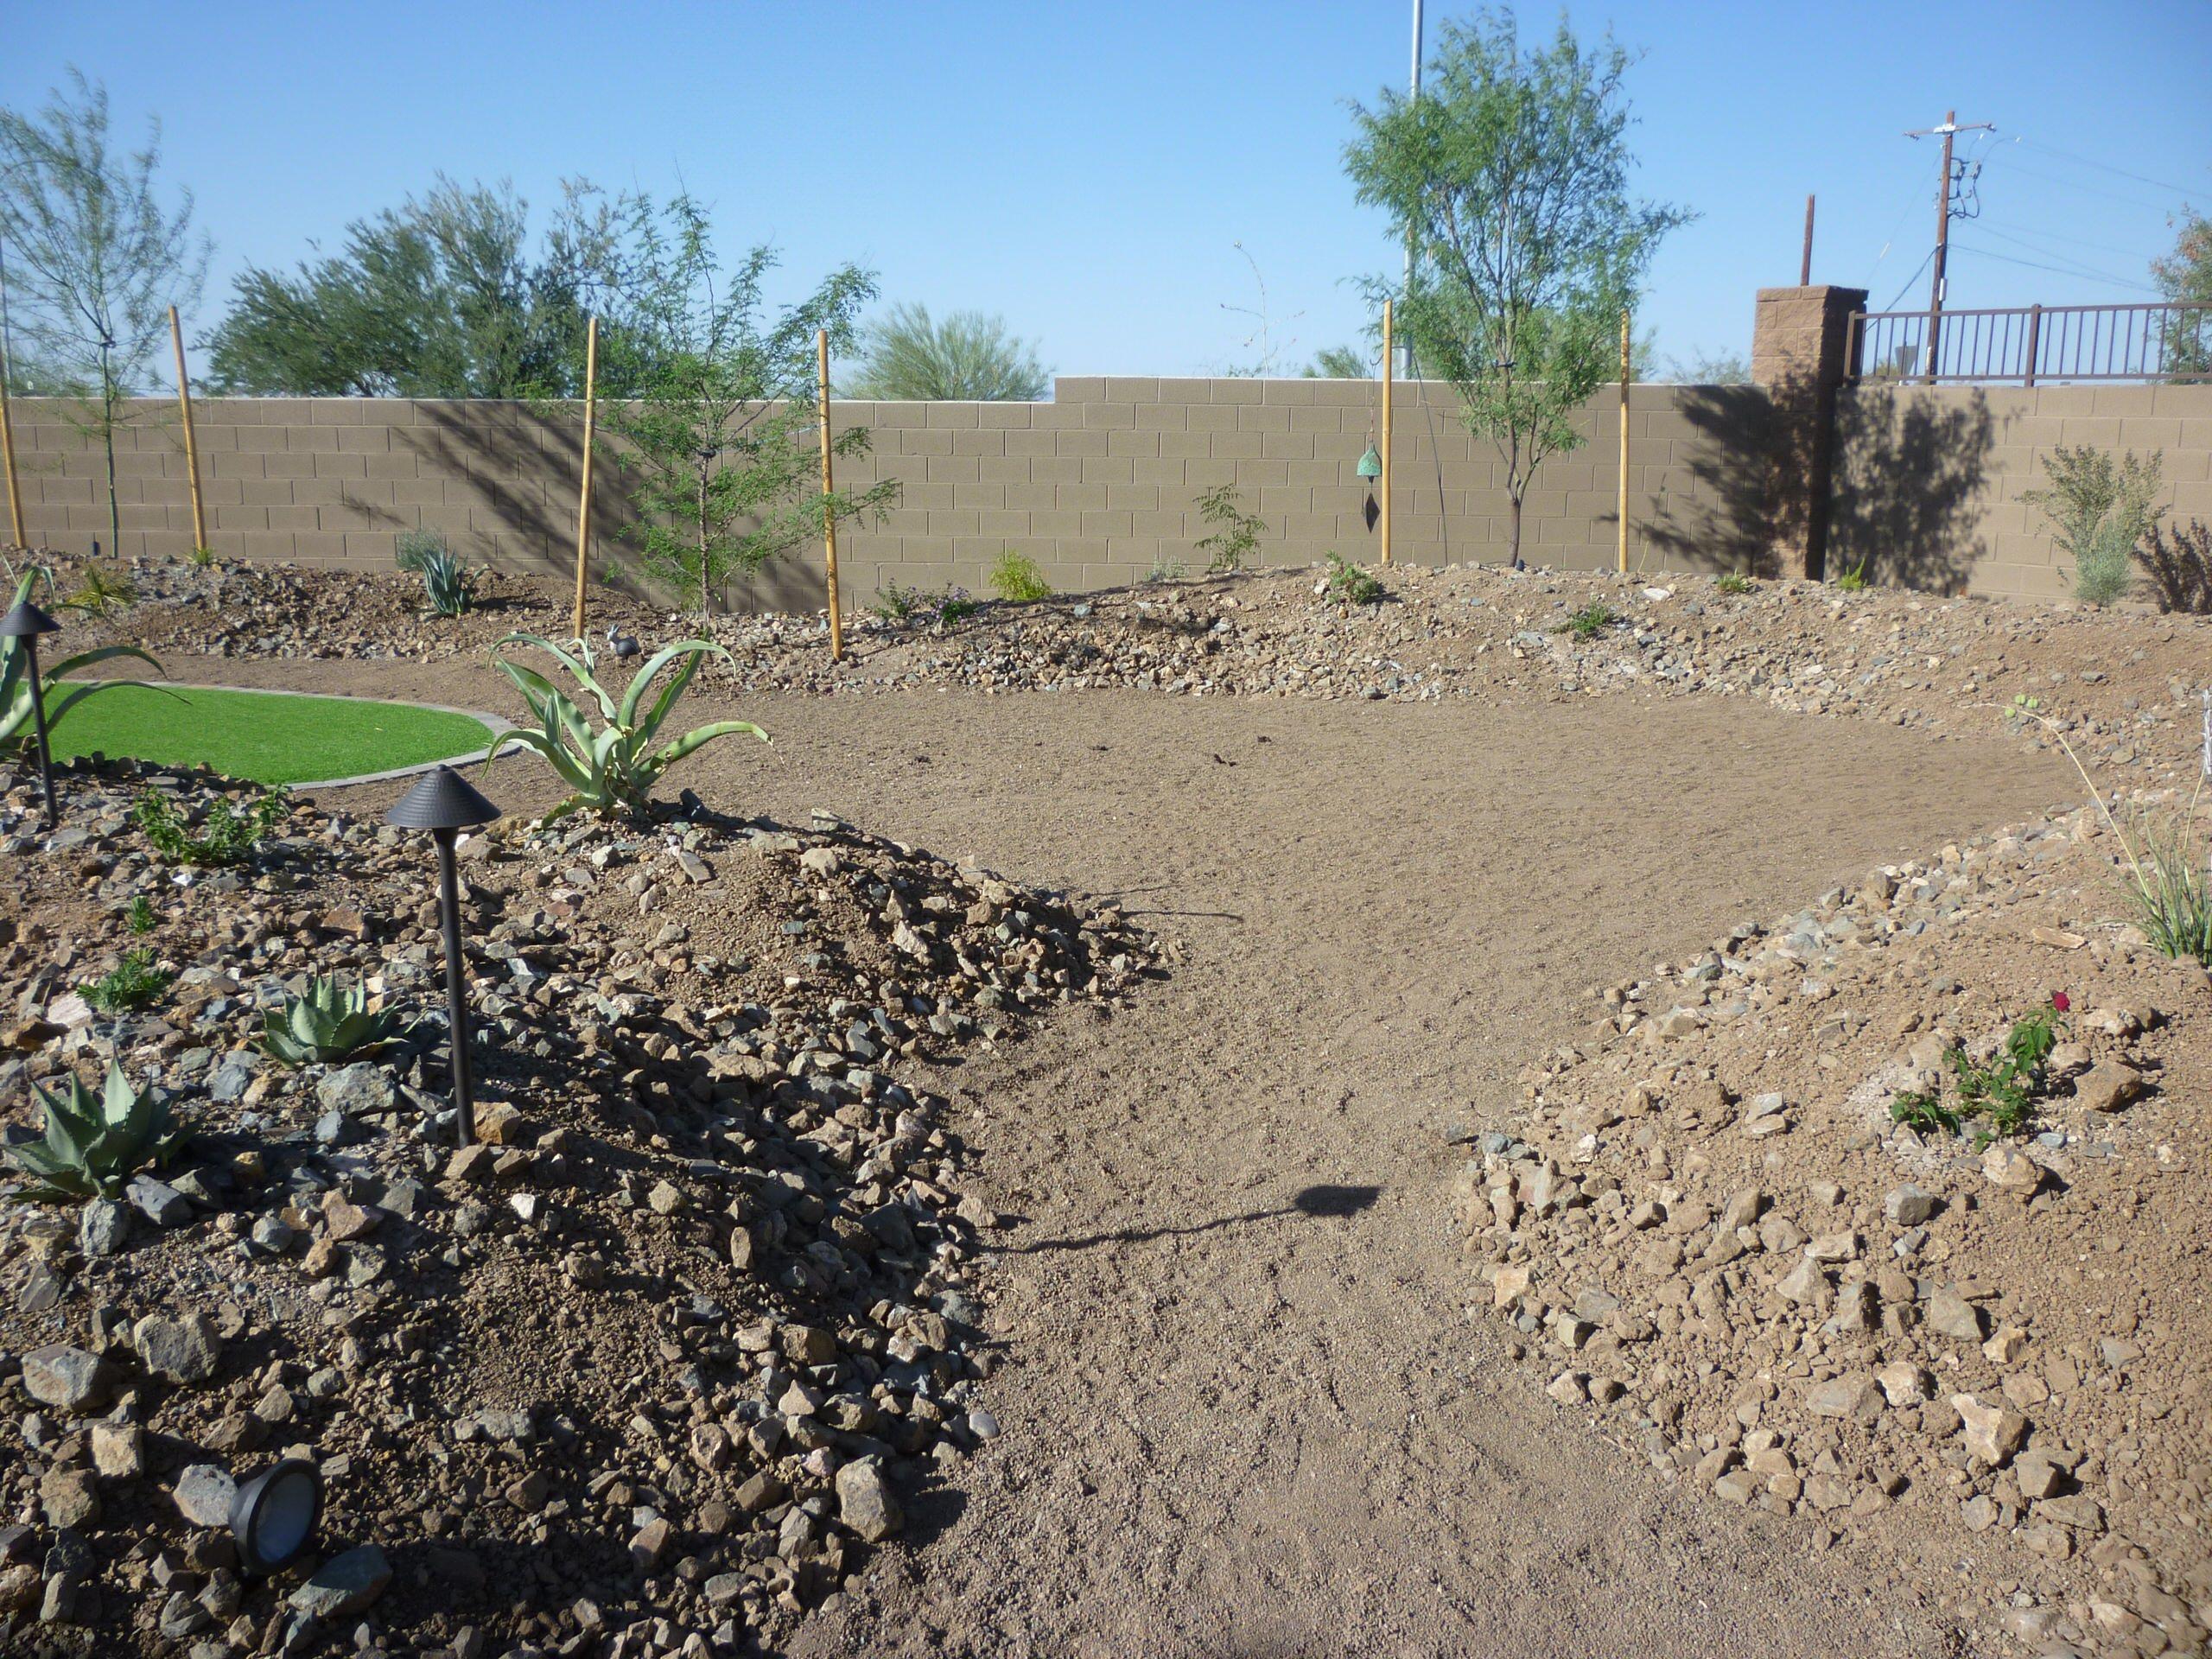 Mounding w/ Rock & Plantings